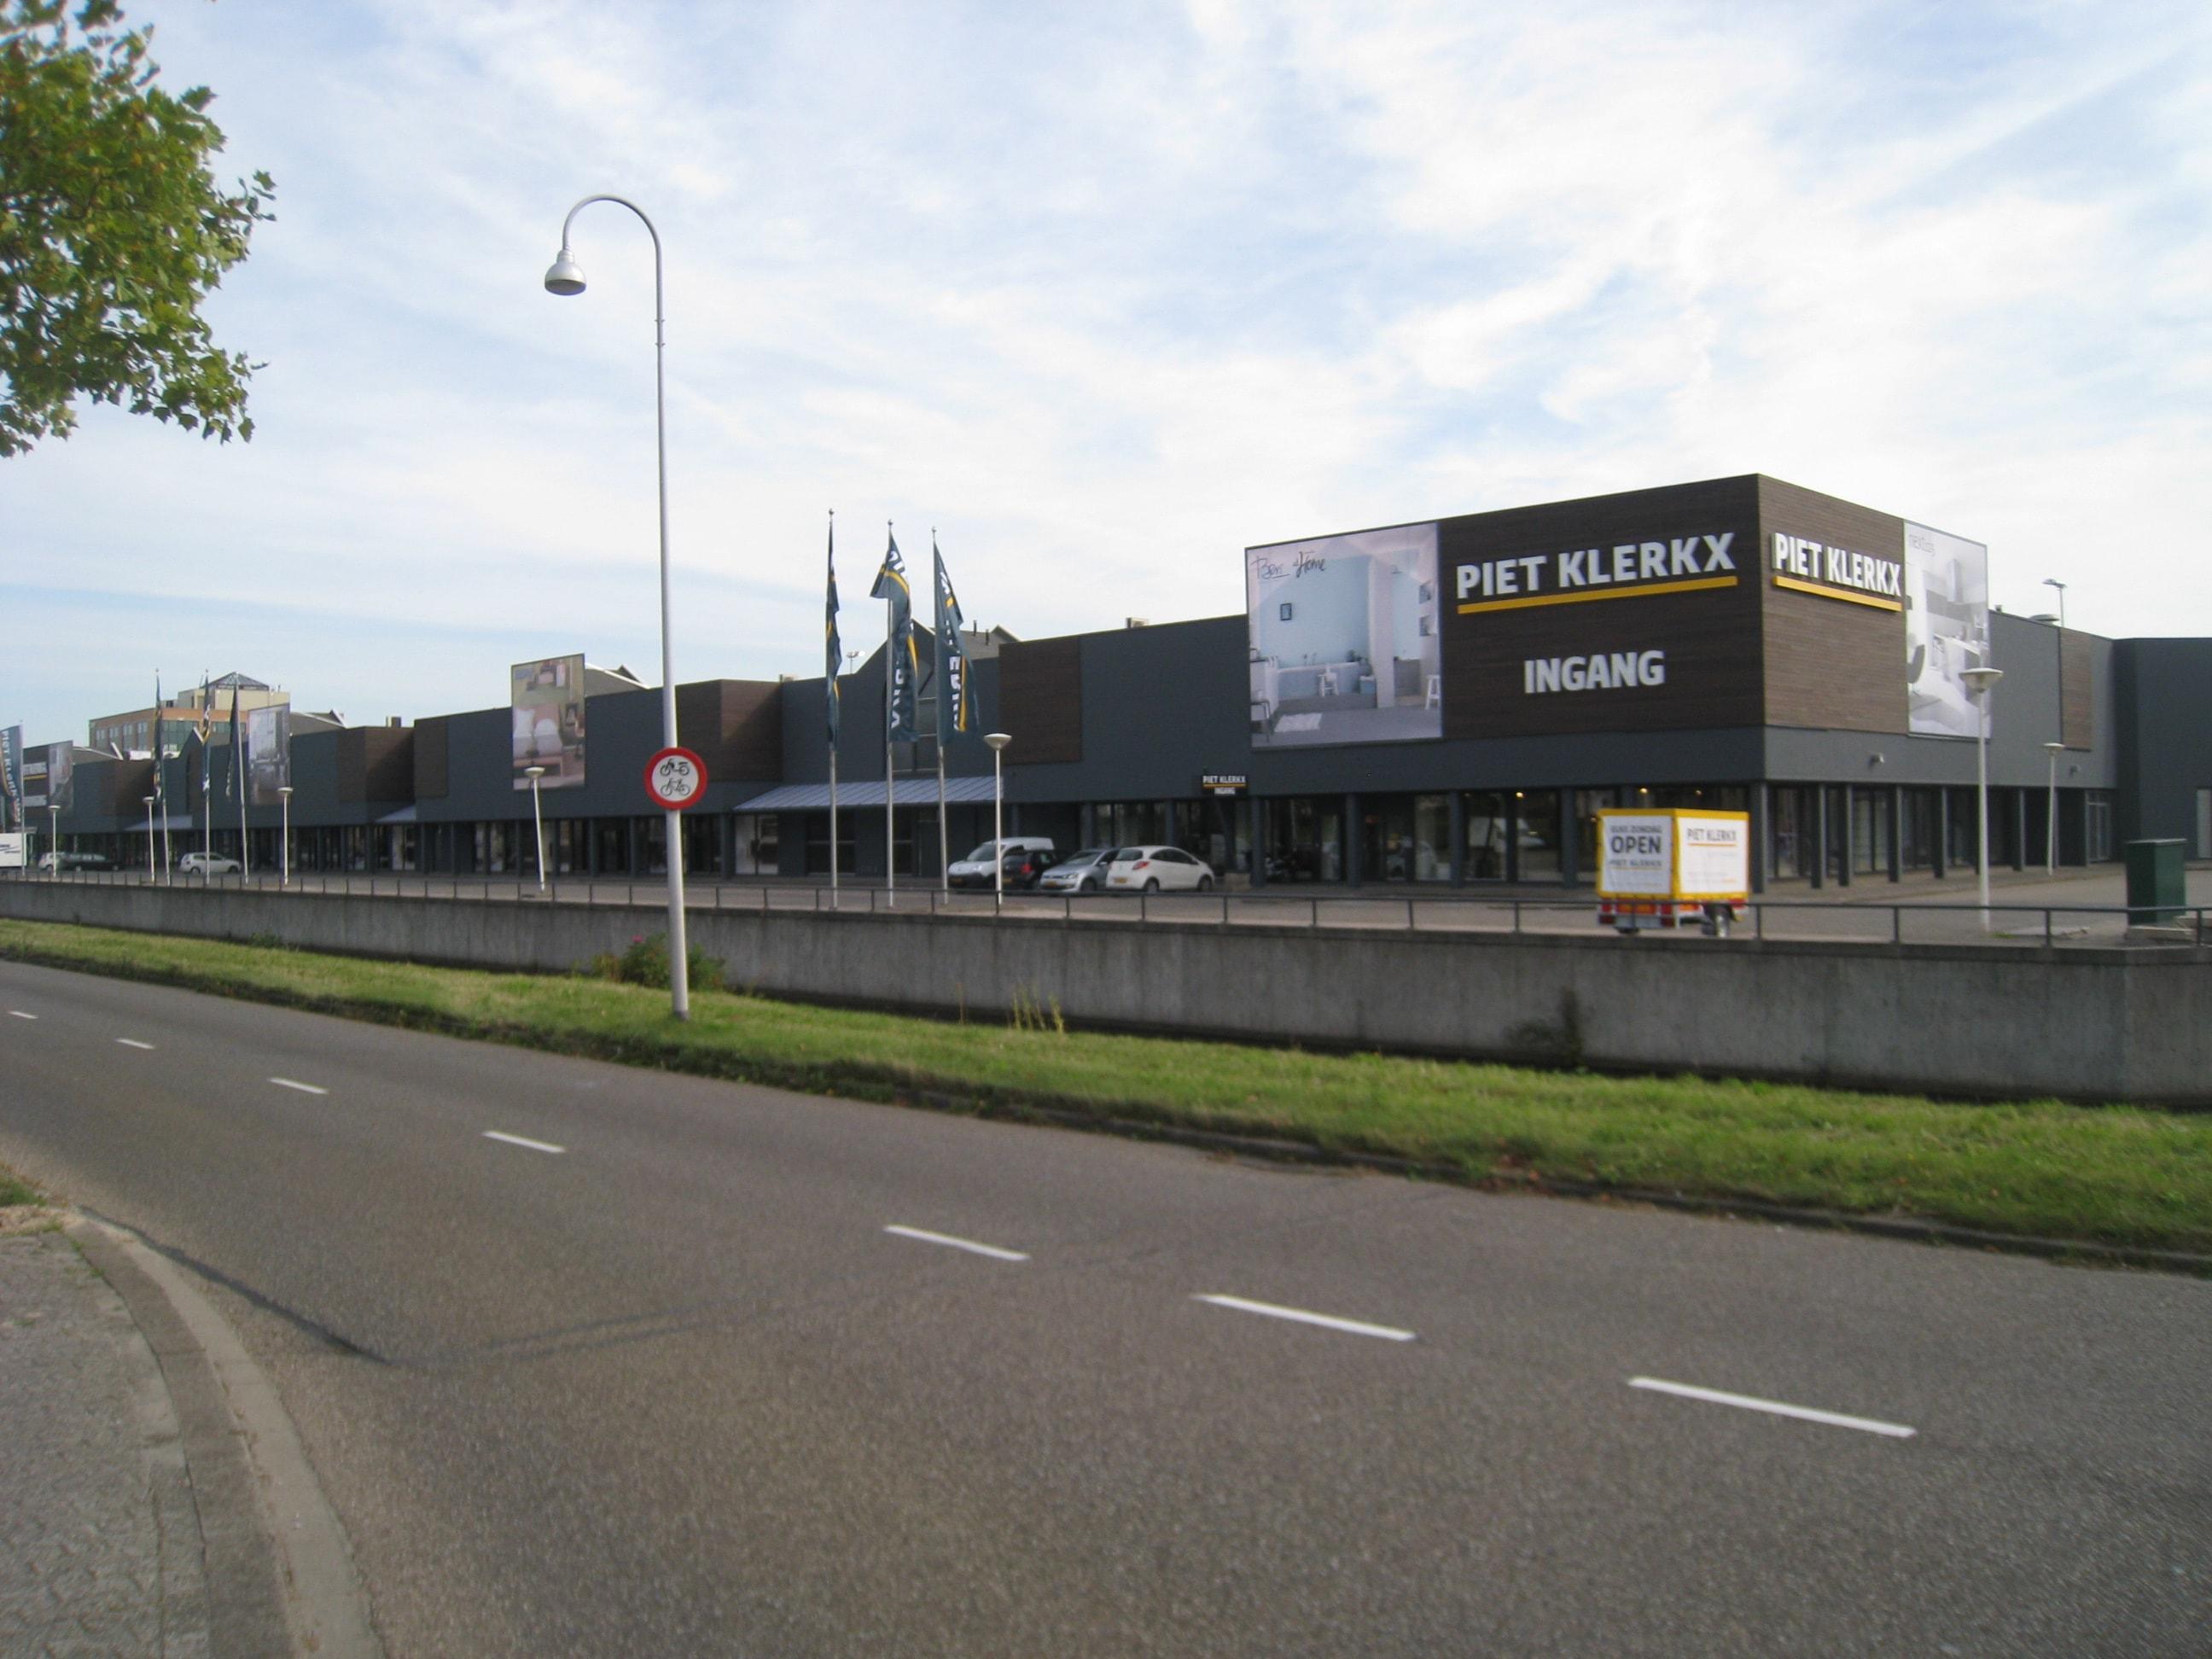 Piet Klerkx Amersfoort : Piet klerkx amersfoort c w groep